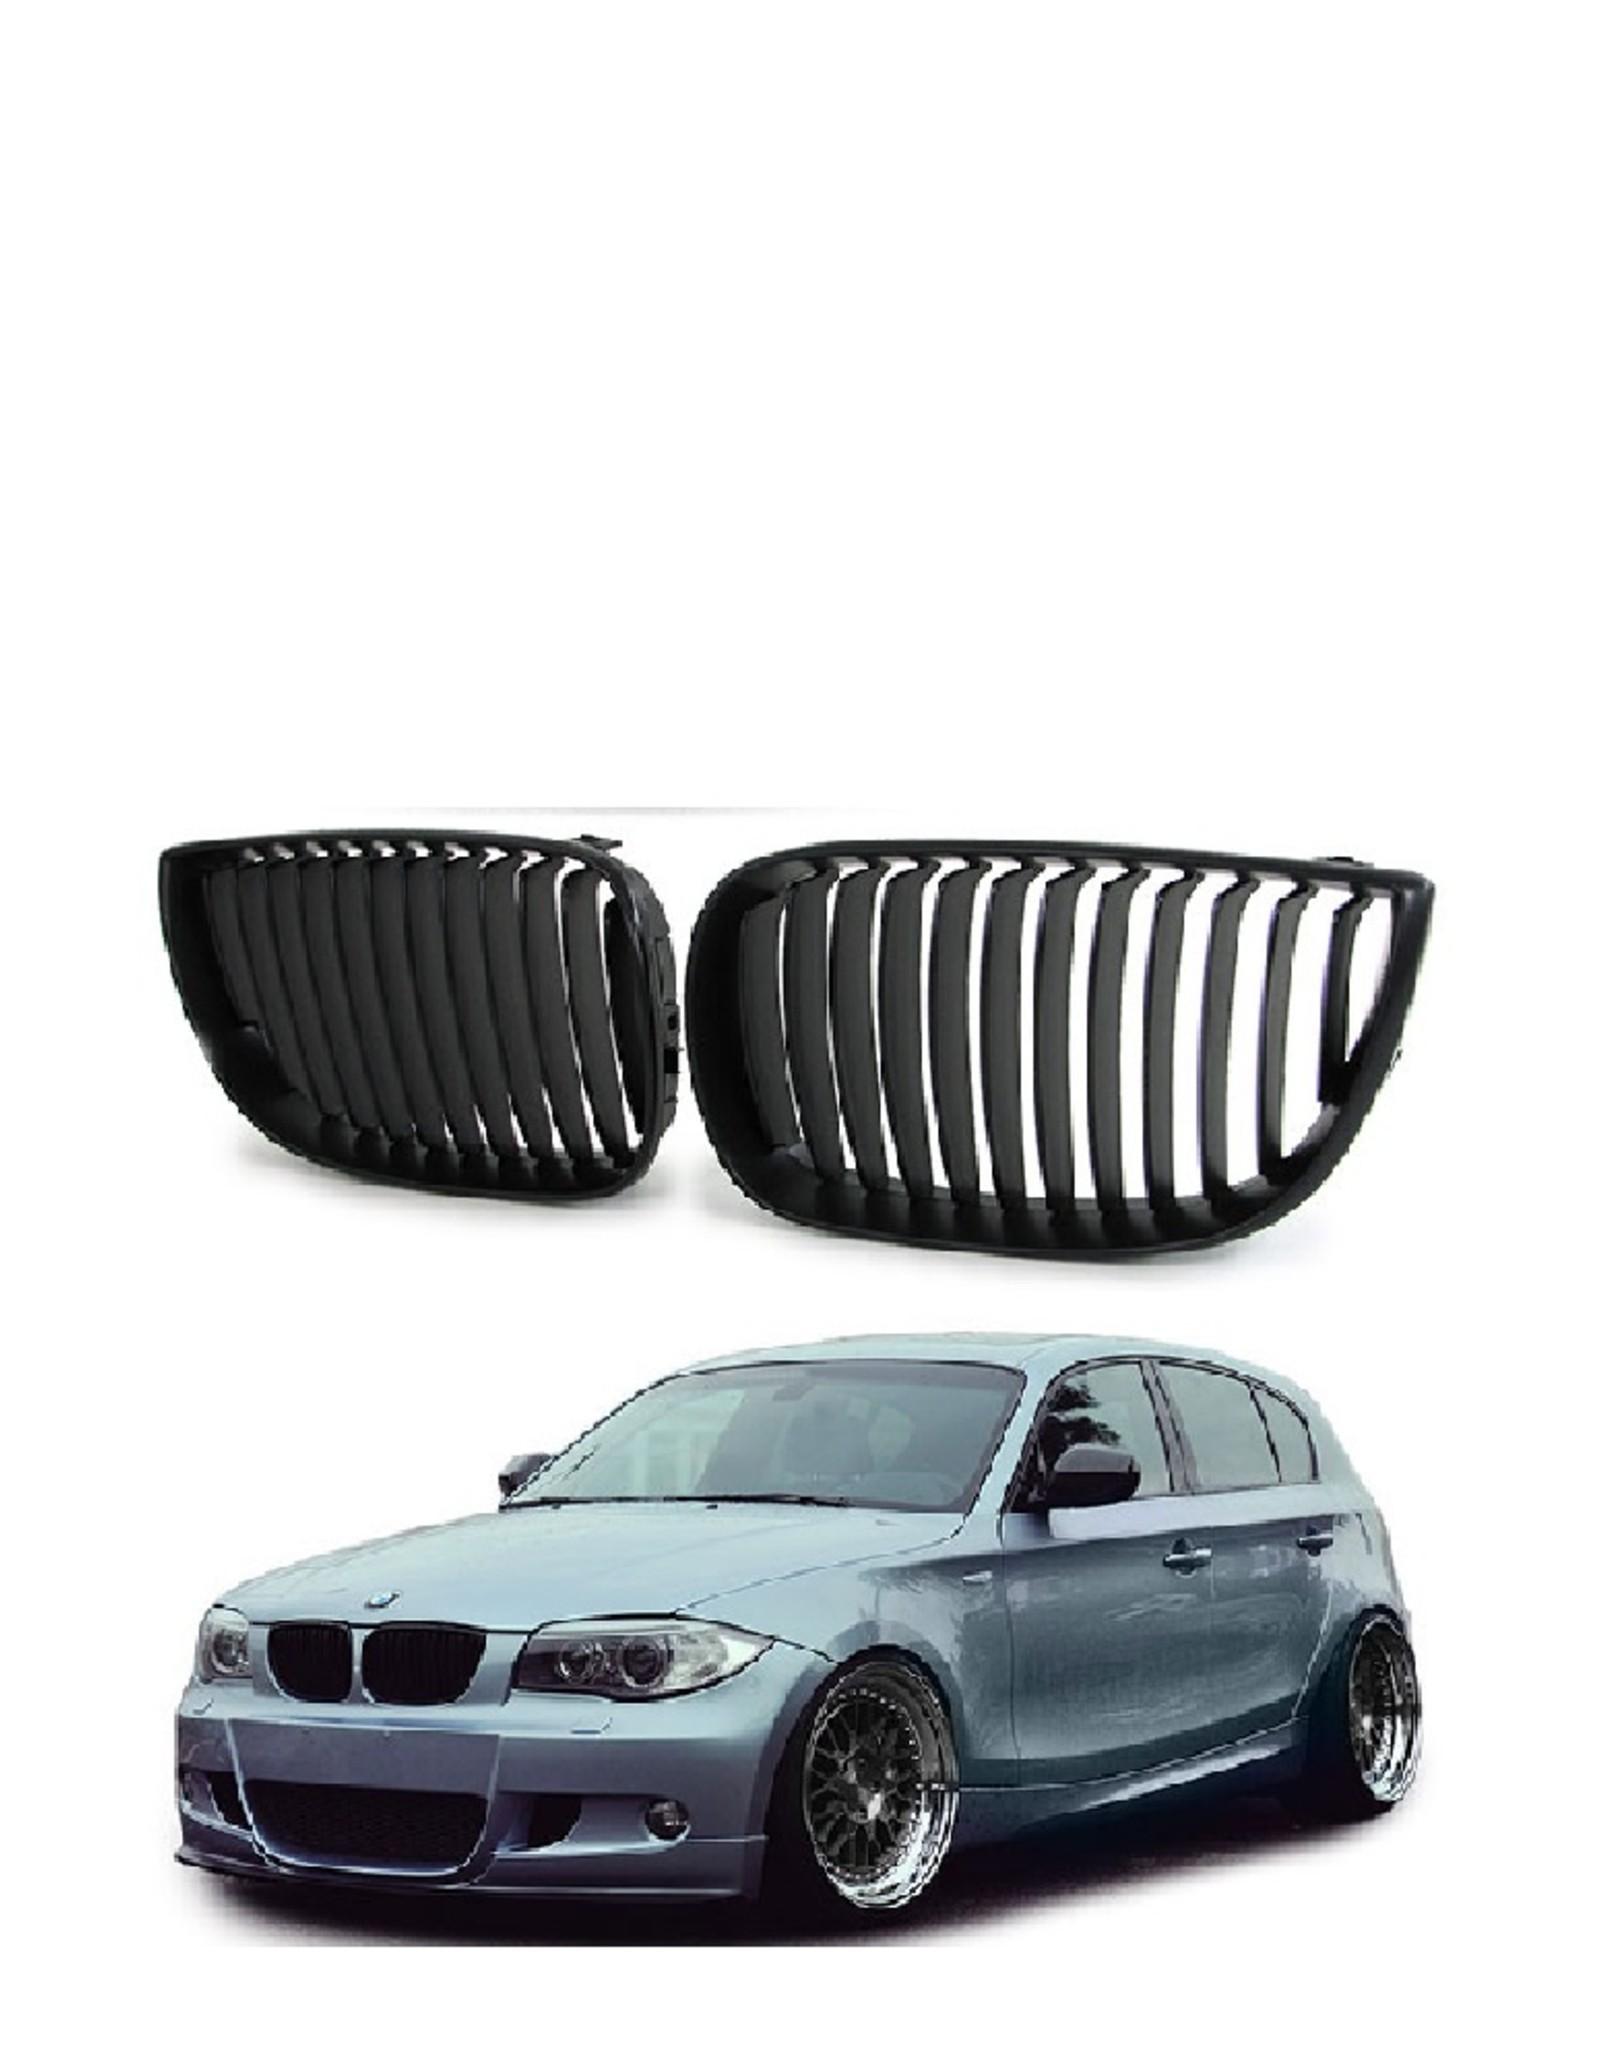 Grille zwart voor BMW 1 serie E81 E87